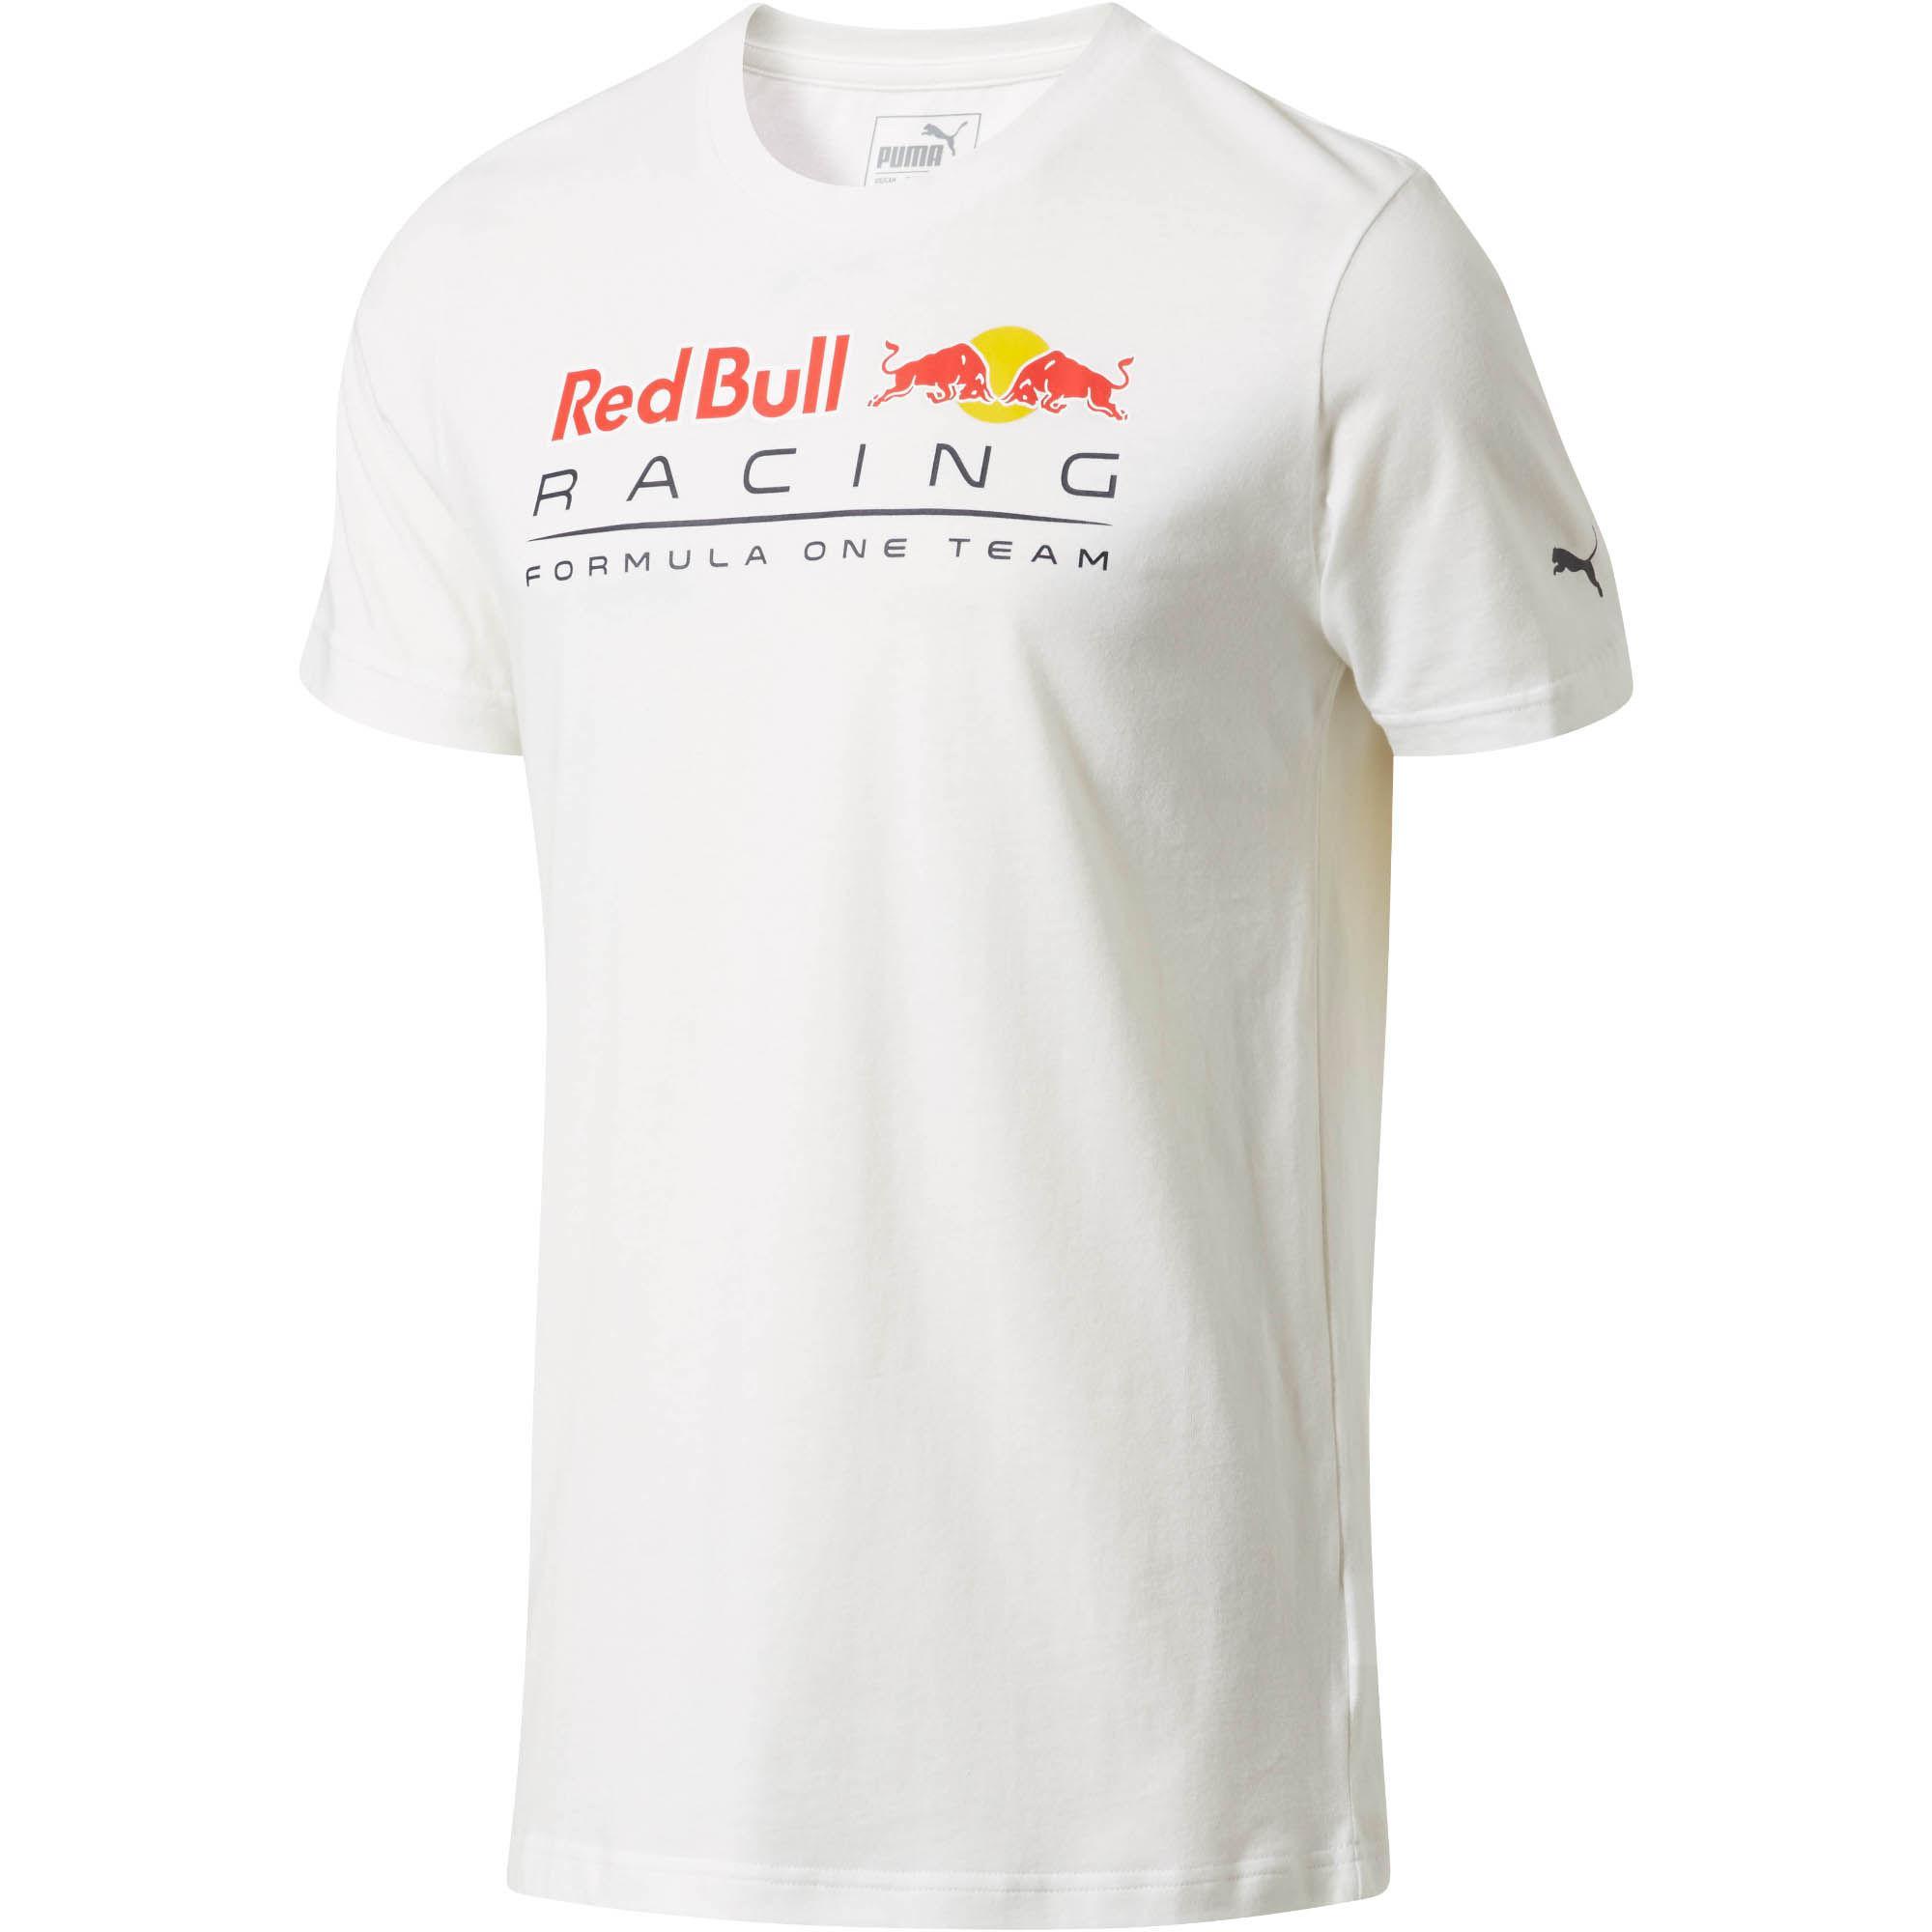 c7ebd62d1384e Lyst - PUMA Red Bull Racing T-shirt in White for Men